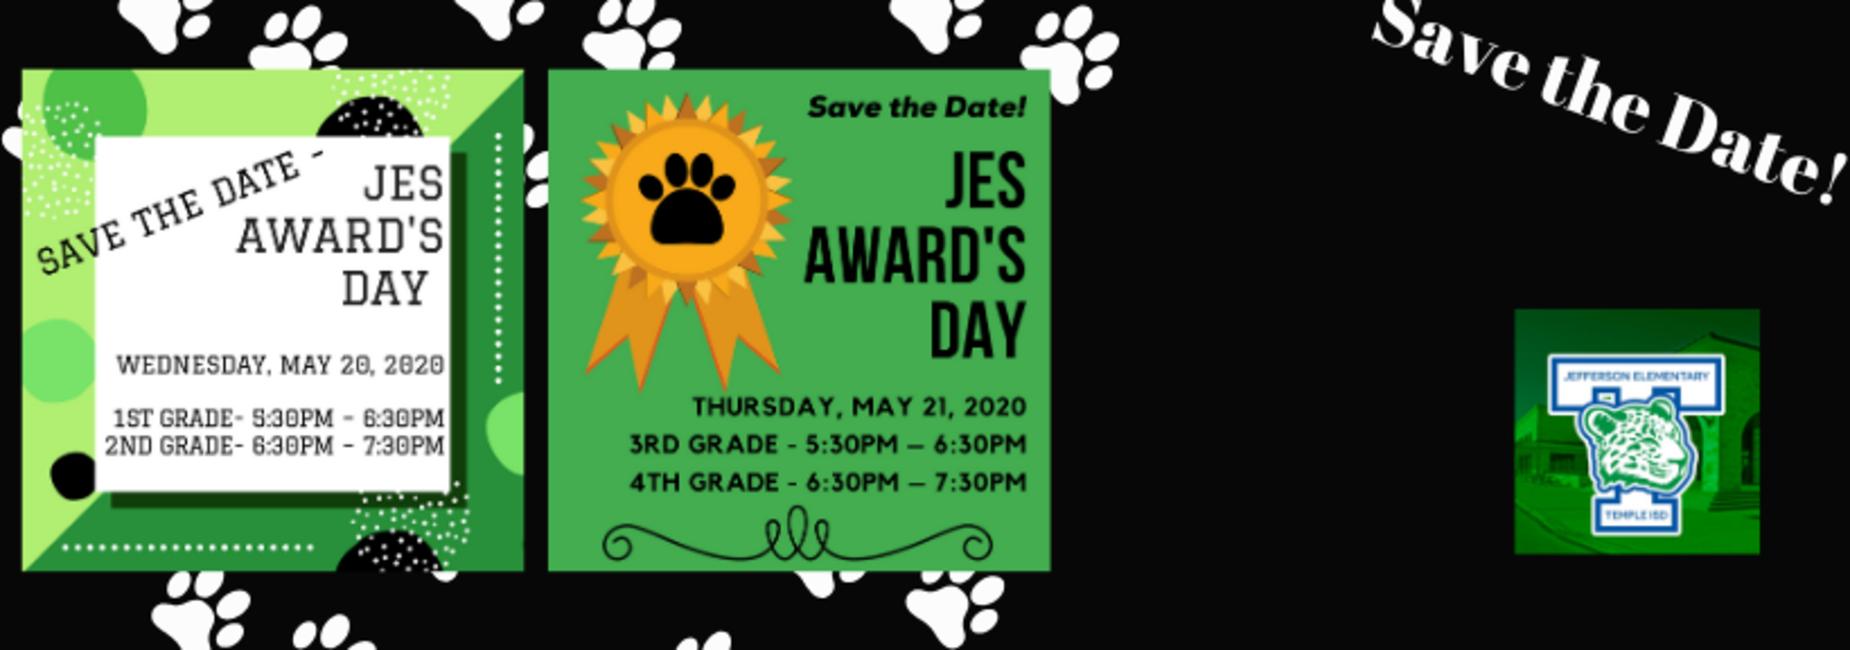 Awards day info